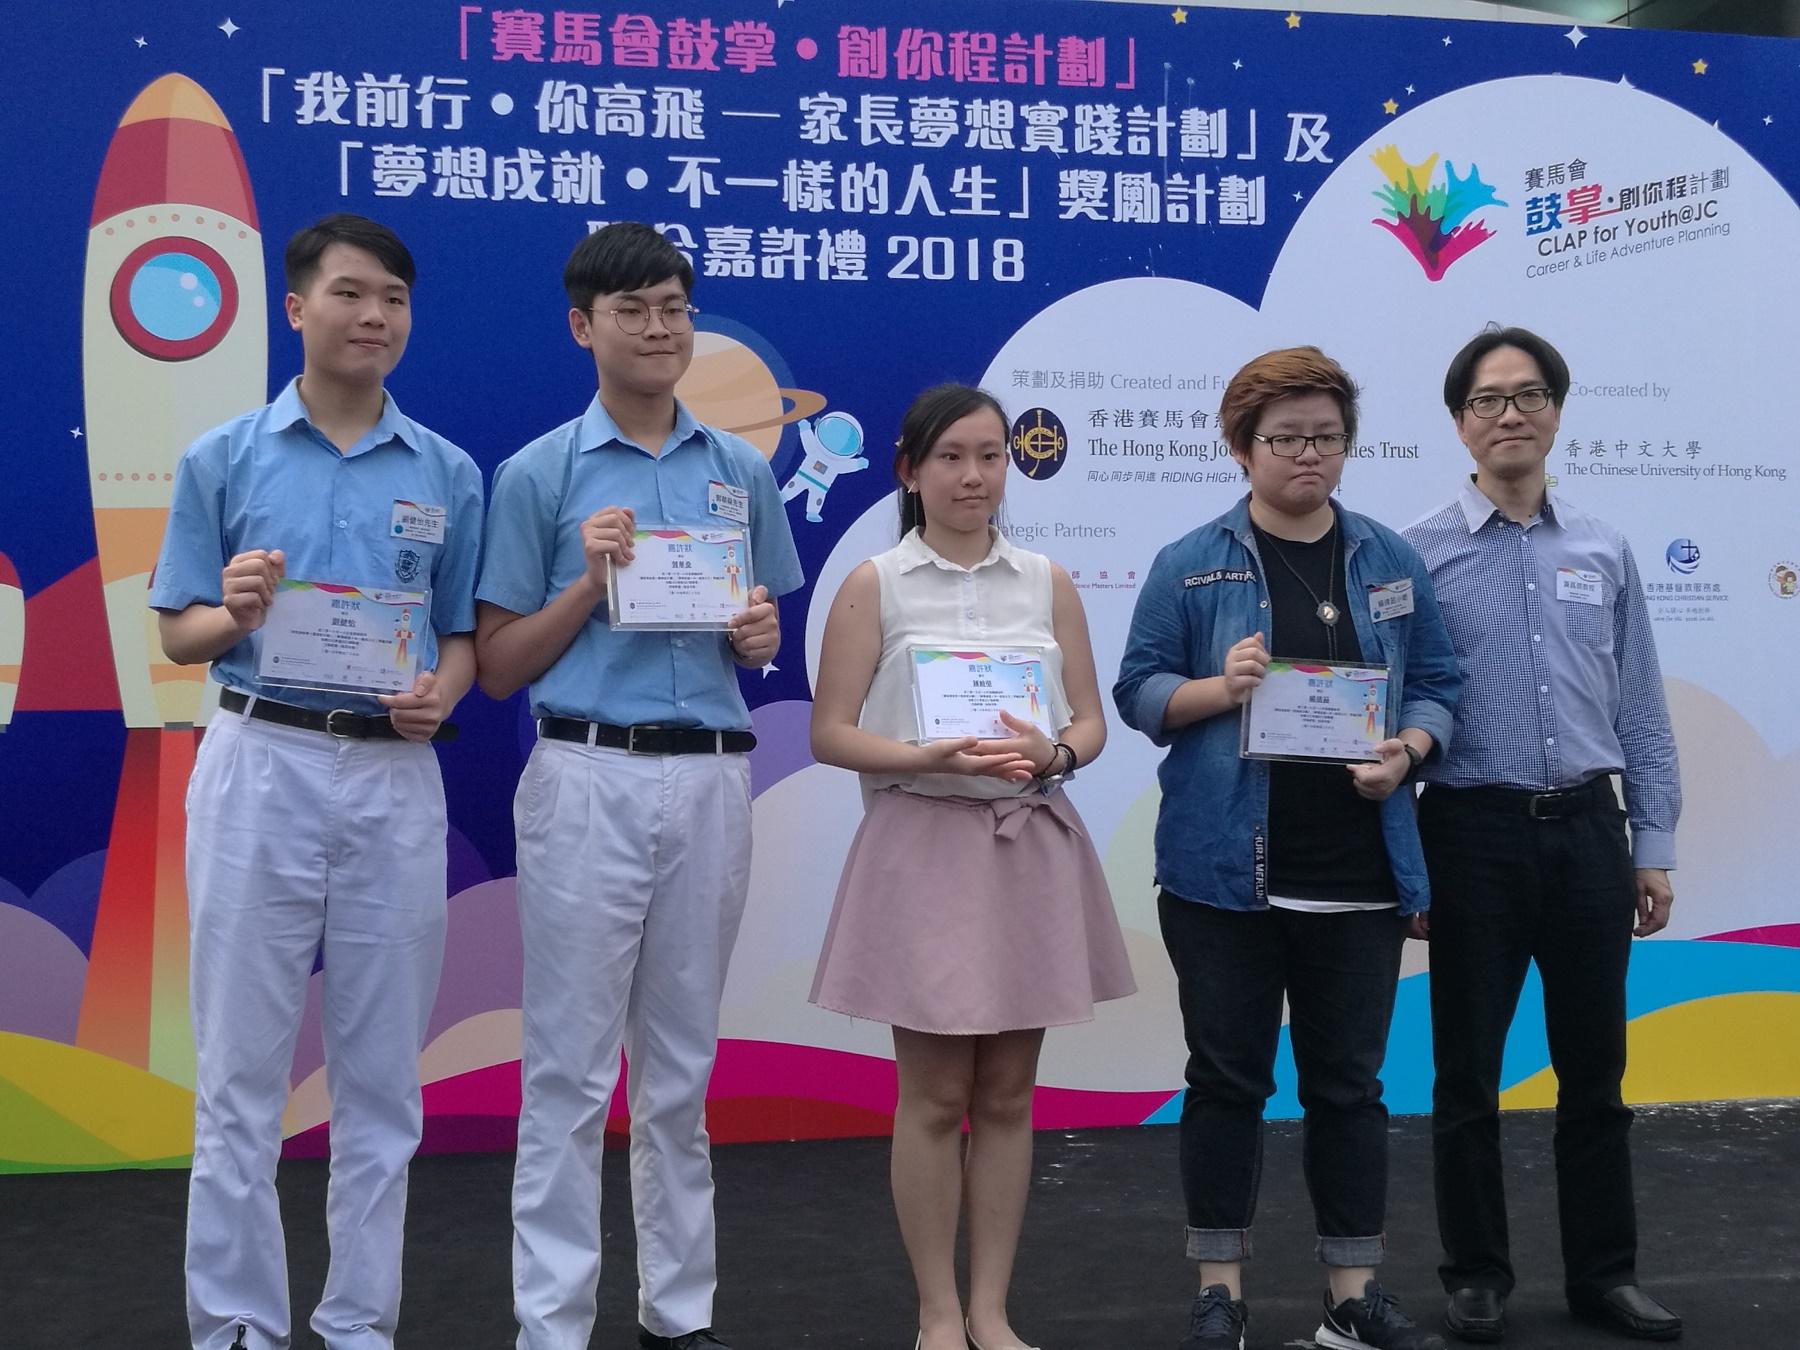 https://www.npc.edu.hk/sites/default/files/img_20180429_164039.jpg